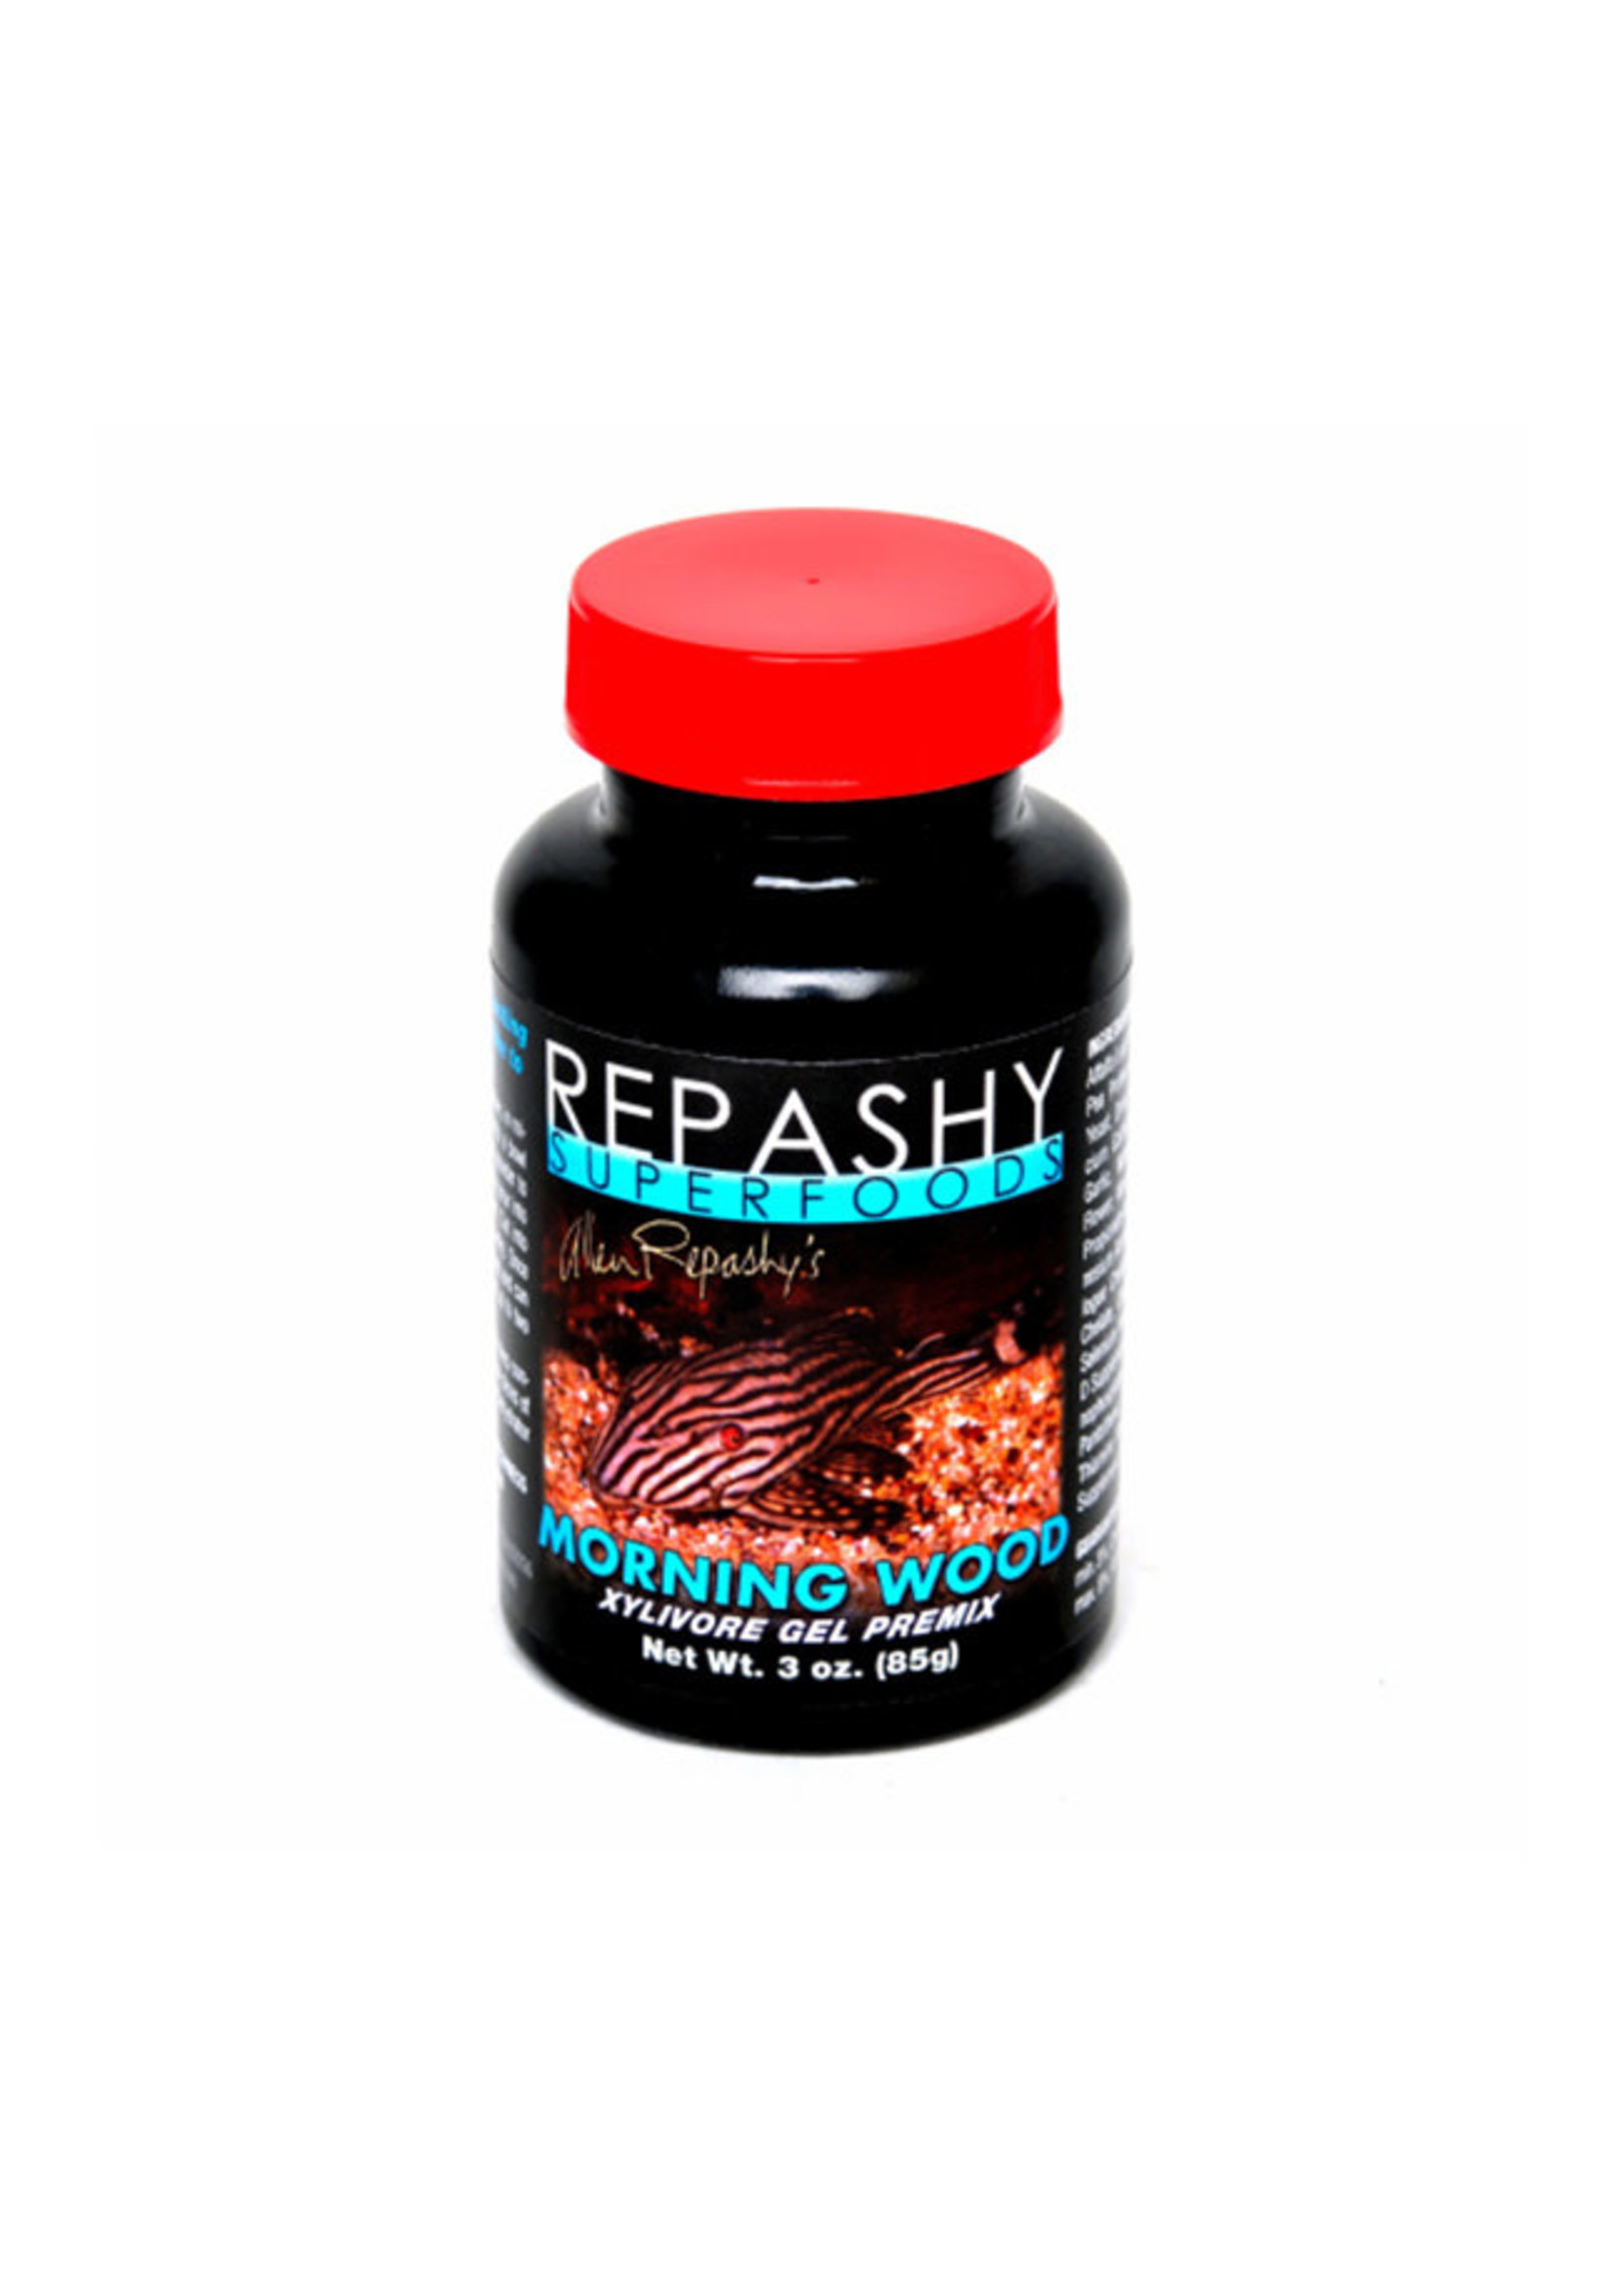 Repashy Superfoods Repashy Morning Wood Xylivore Gel Premix